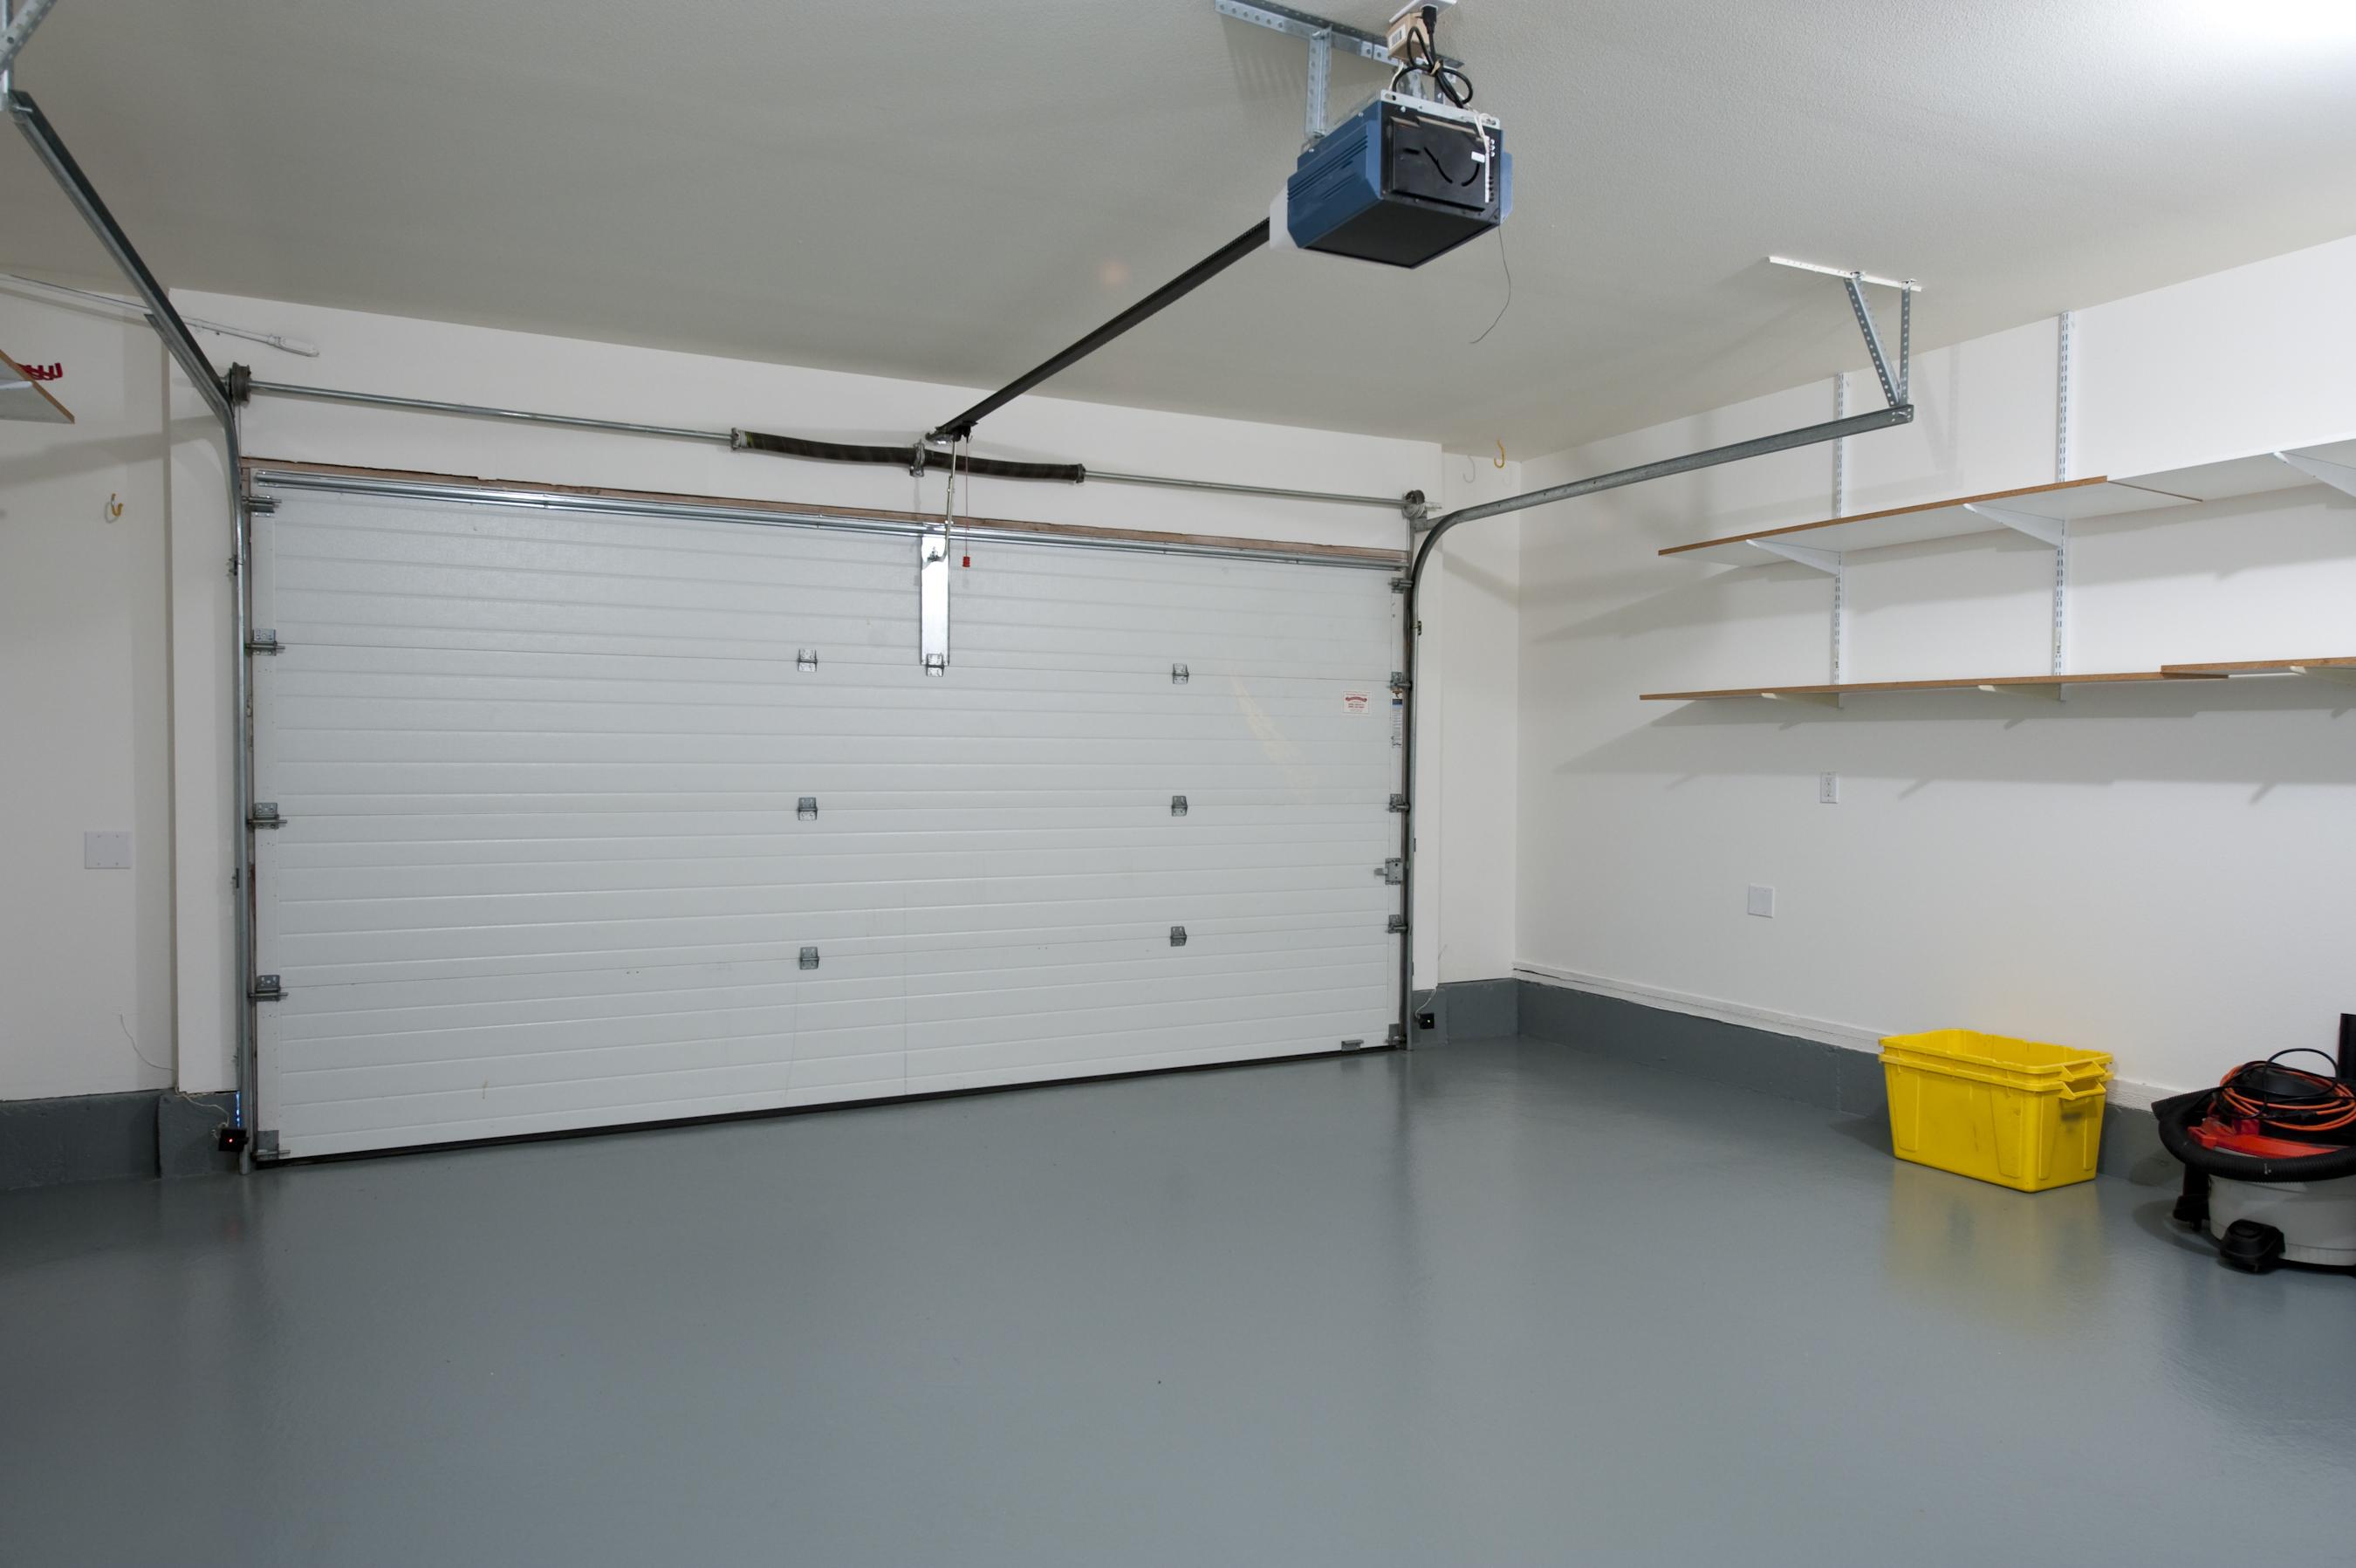 identifying bugs in the garage [ 1637 x 1090 Pixel ]